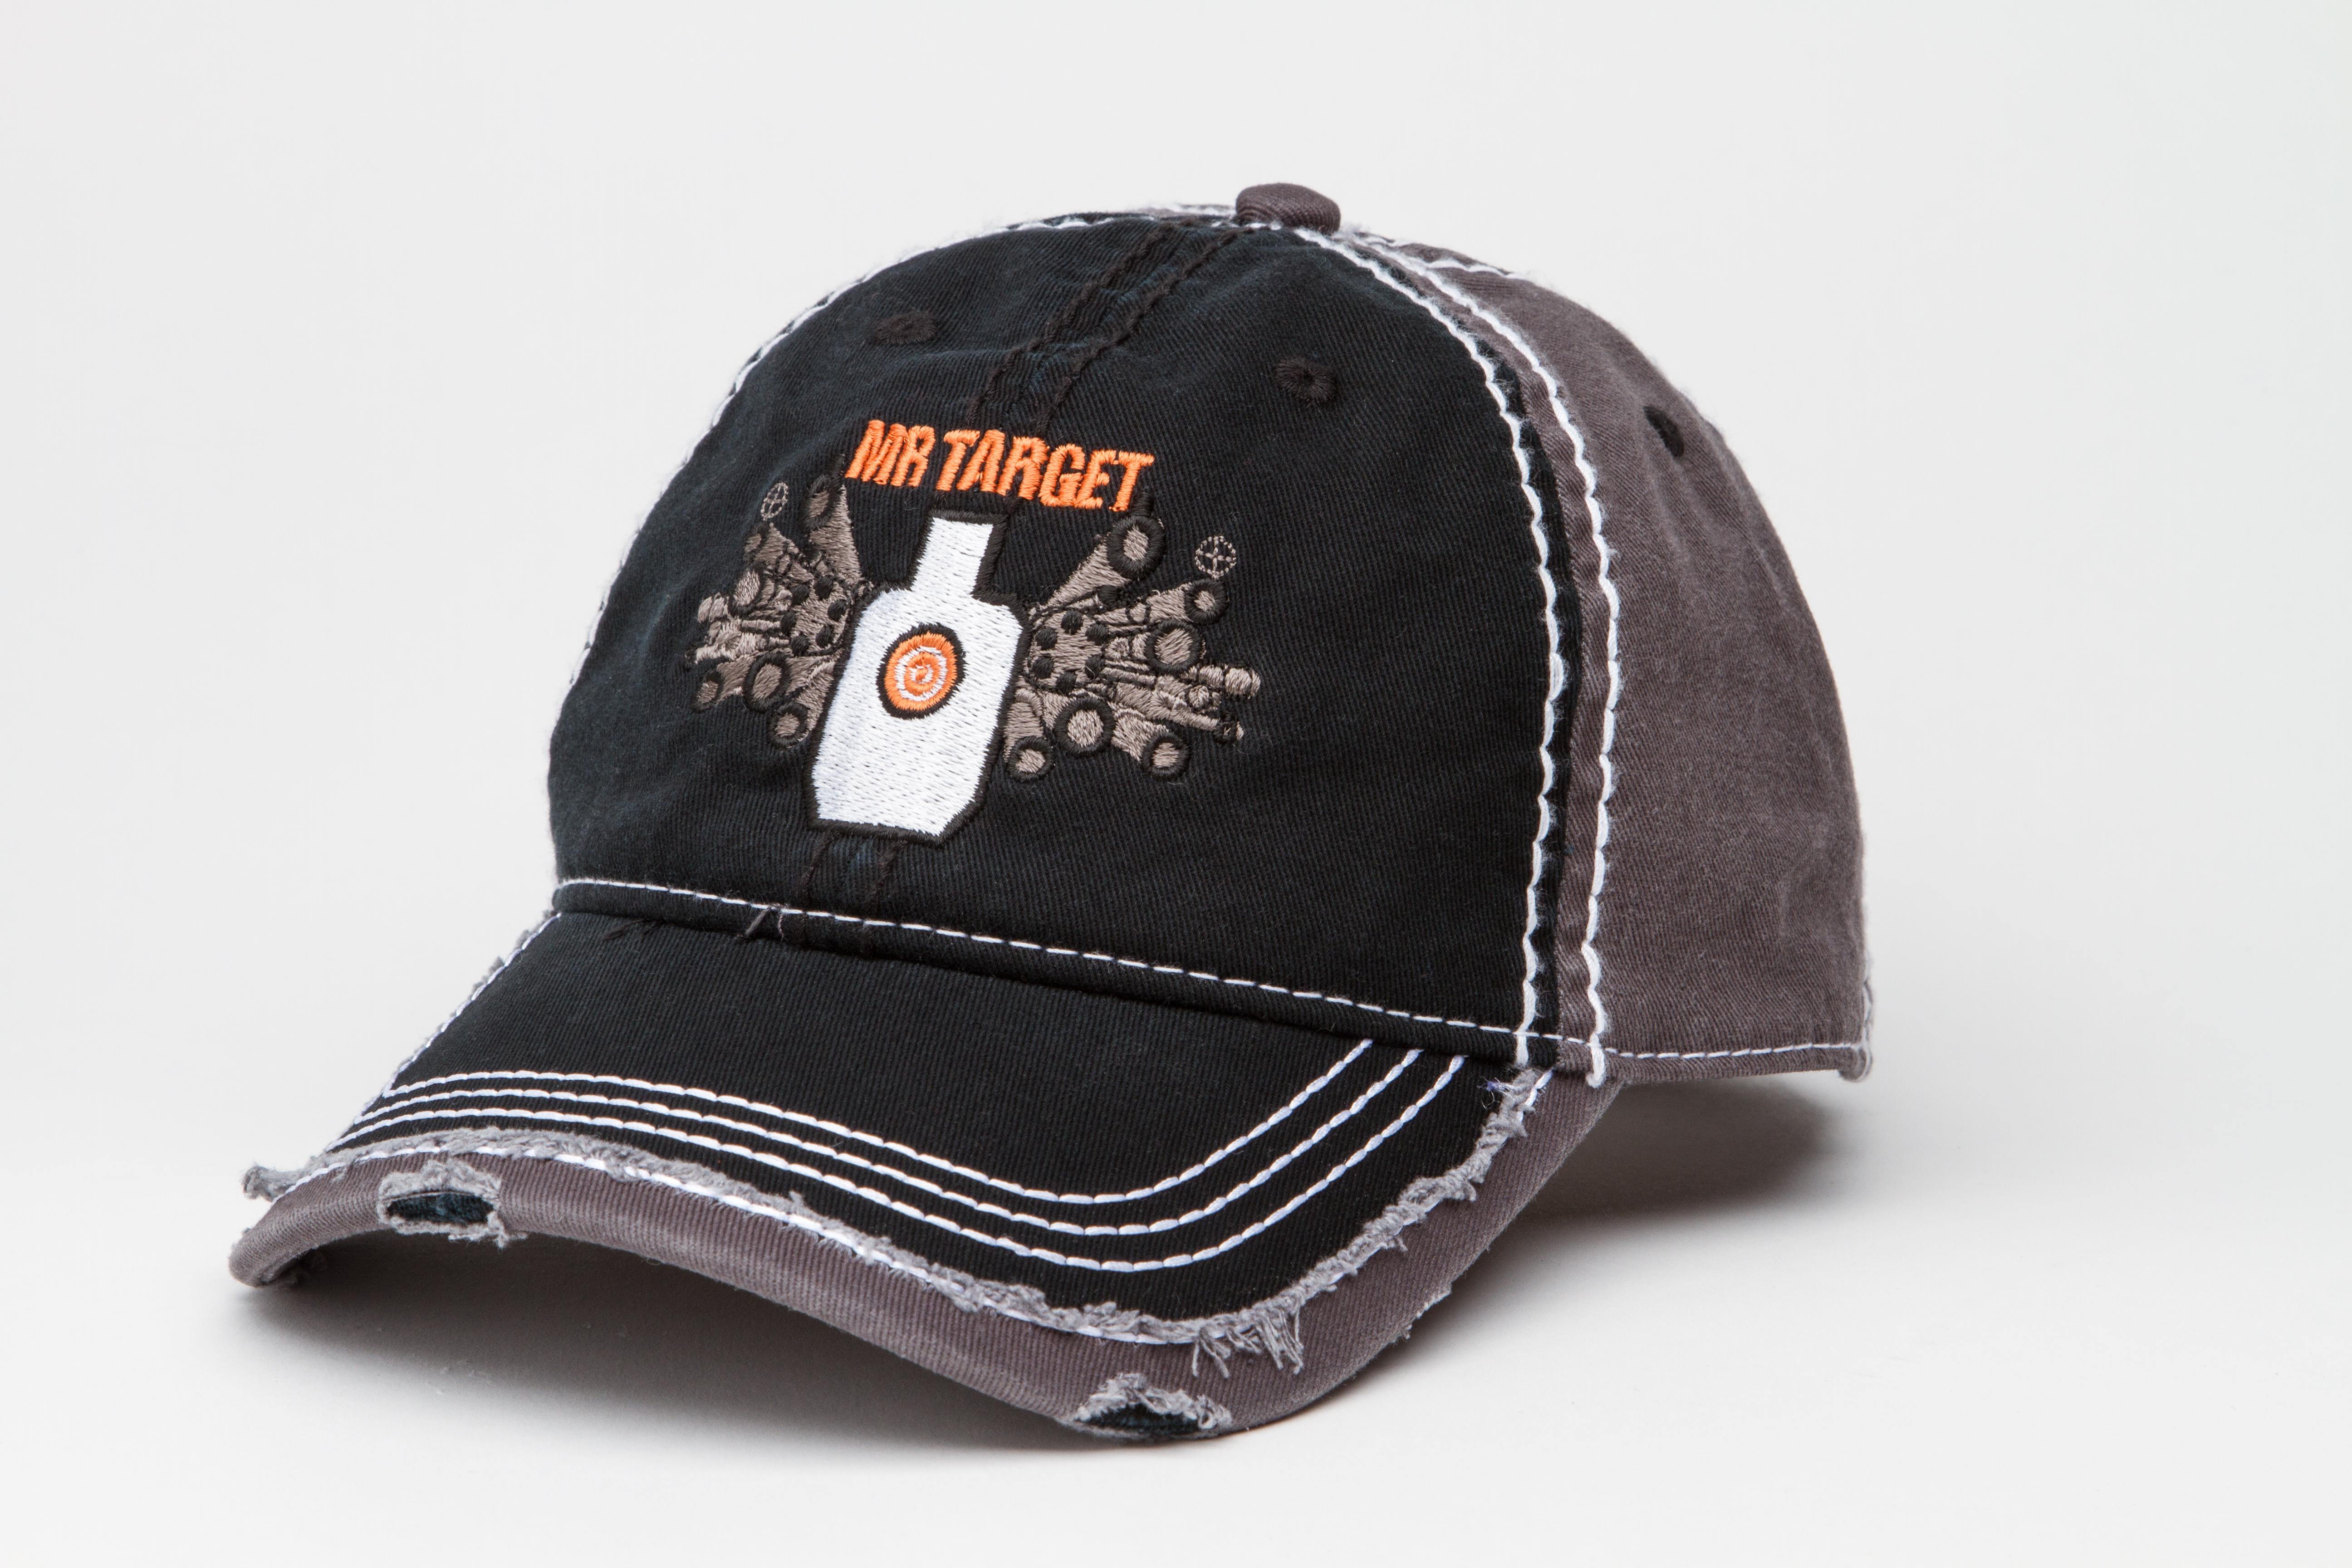 mrtarget-mrt-blackottohat-black-hat-ball-cap-tactical- 4fa5aff3643